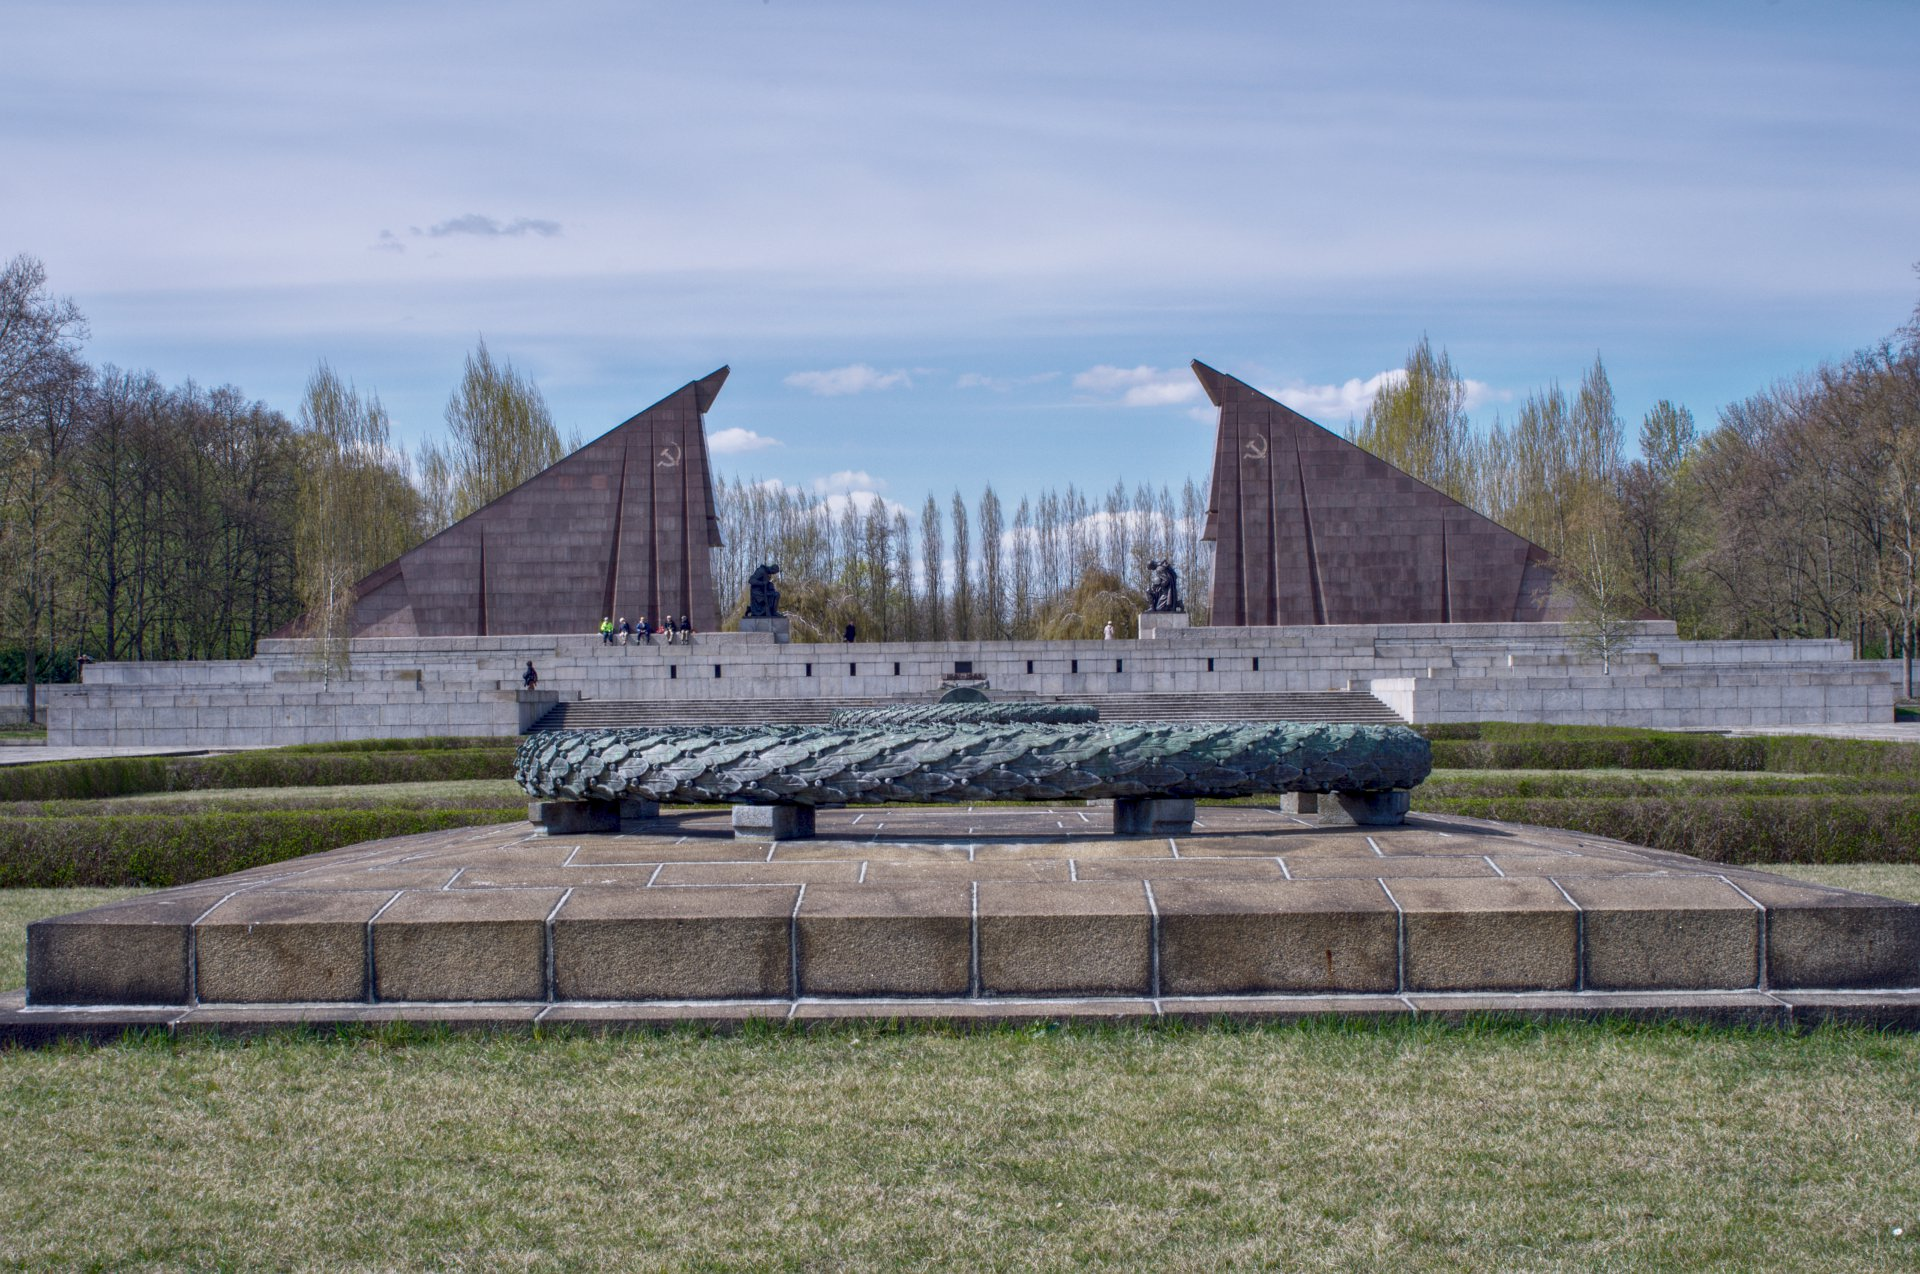 treptower park soviet war memorial foto bugil bokep 2017. Black Bedroom Furniture Sets. Home Design Ideas